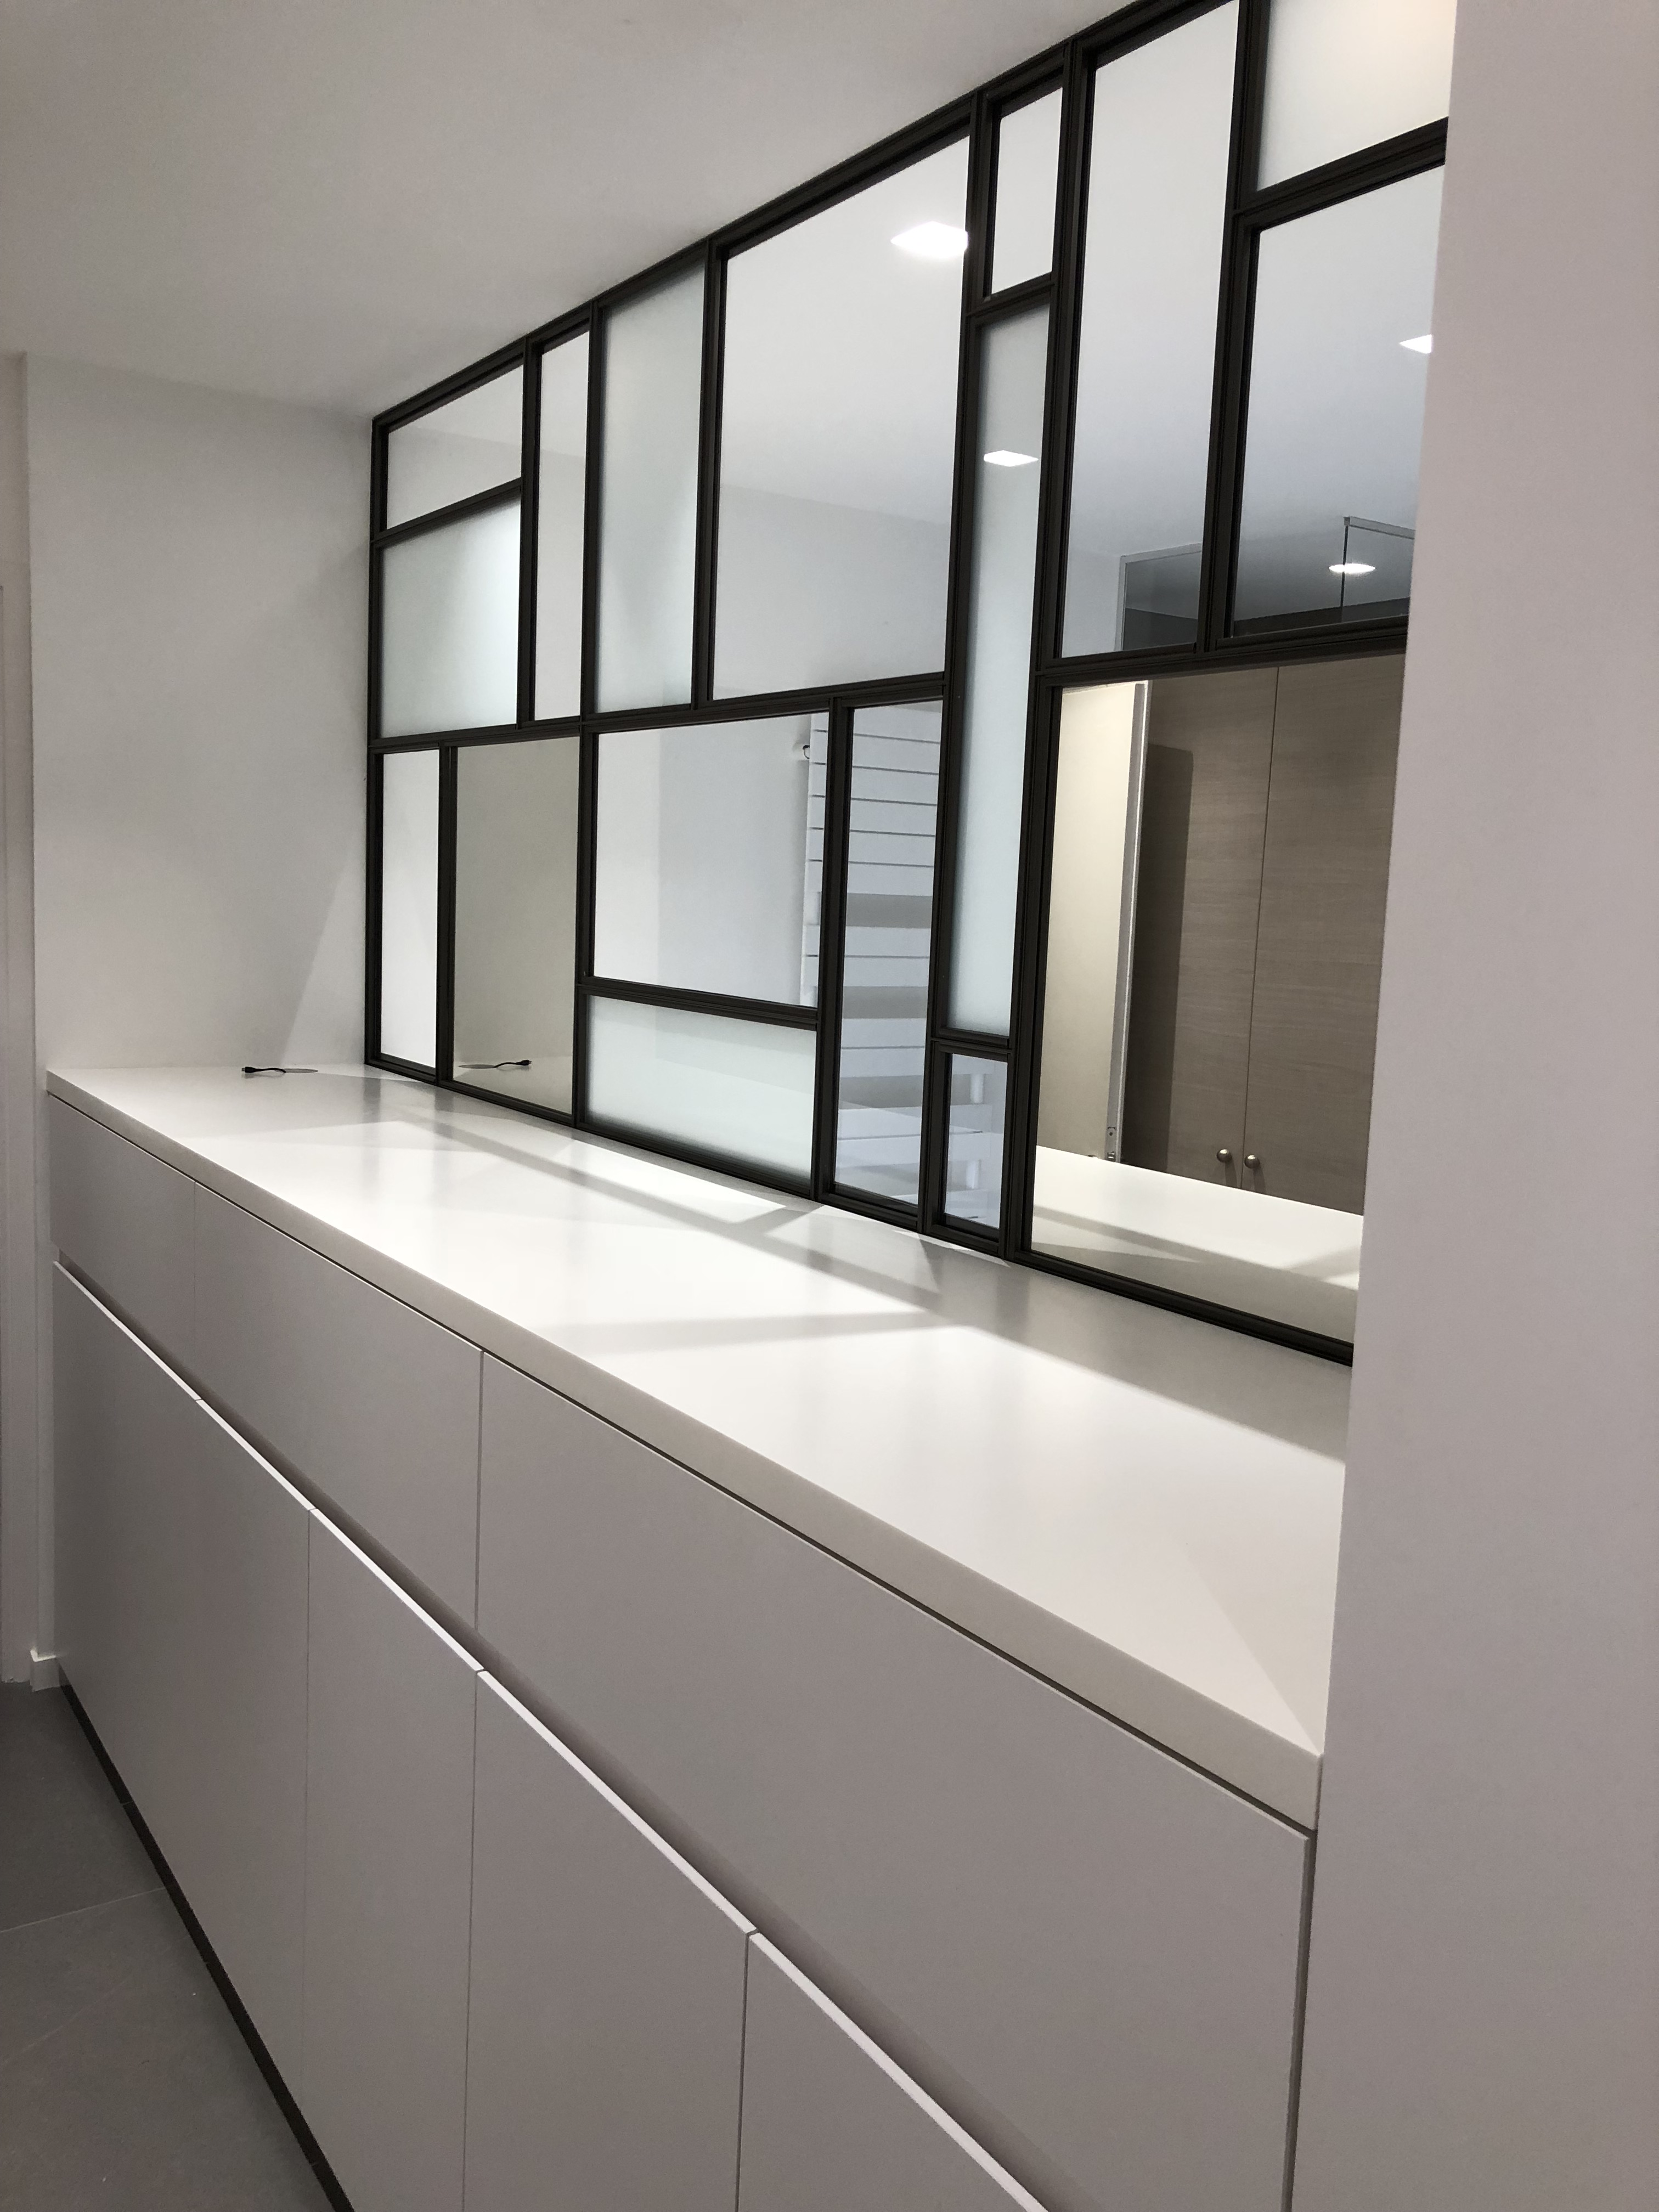 cloison type atelier d 39 artiste en verre et m tal. Black Bedroom Furniture Sets. Home Design Ideas